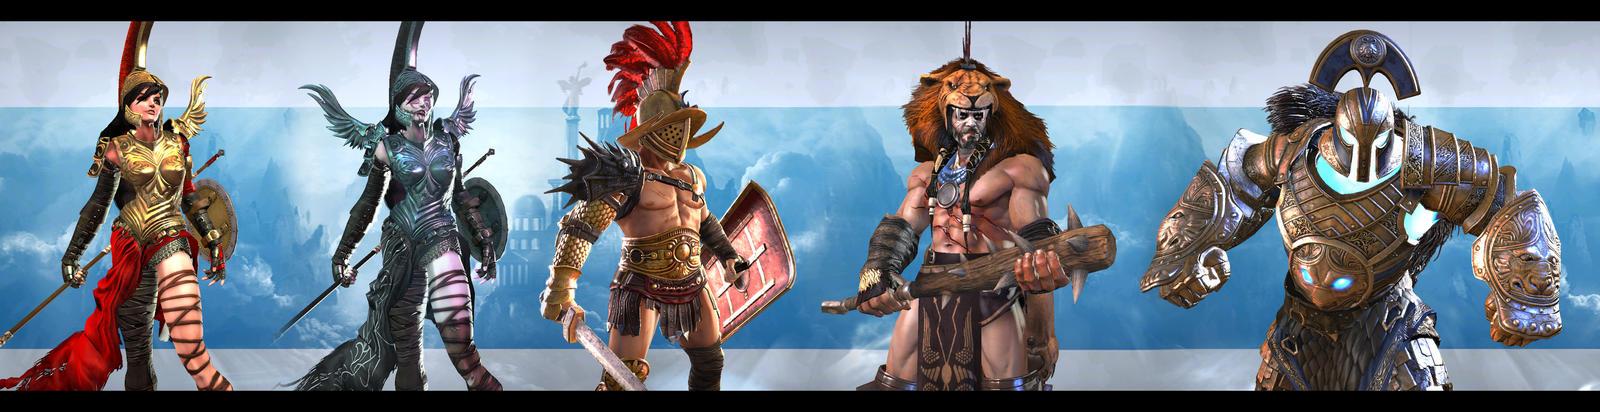 Gameloft's Gods of Rome